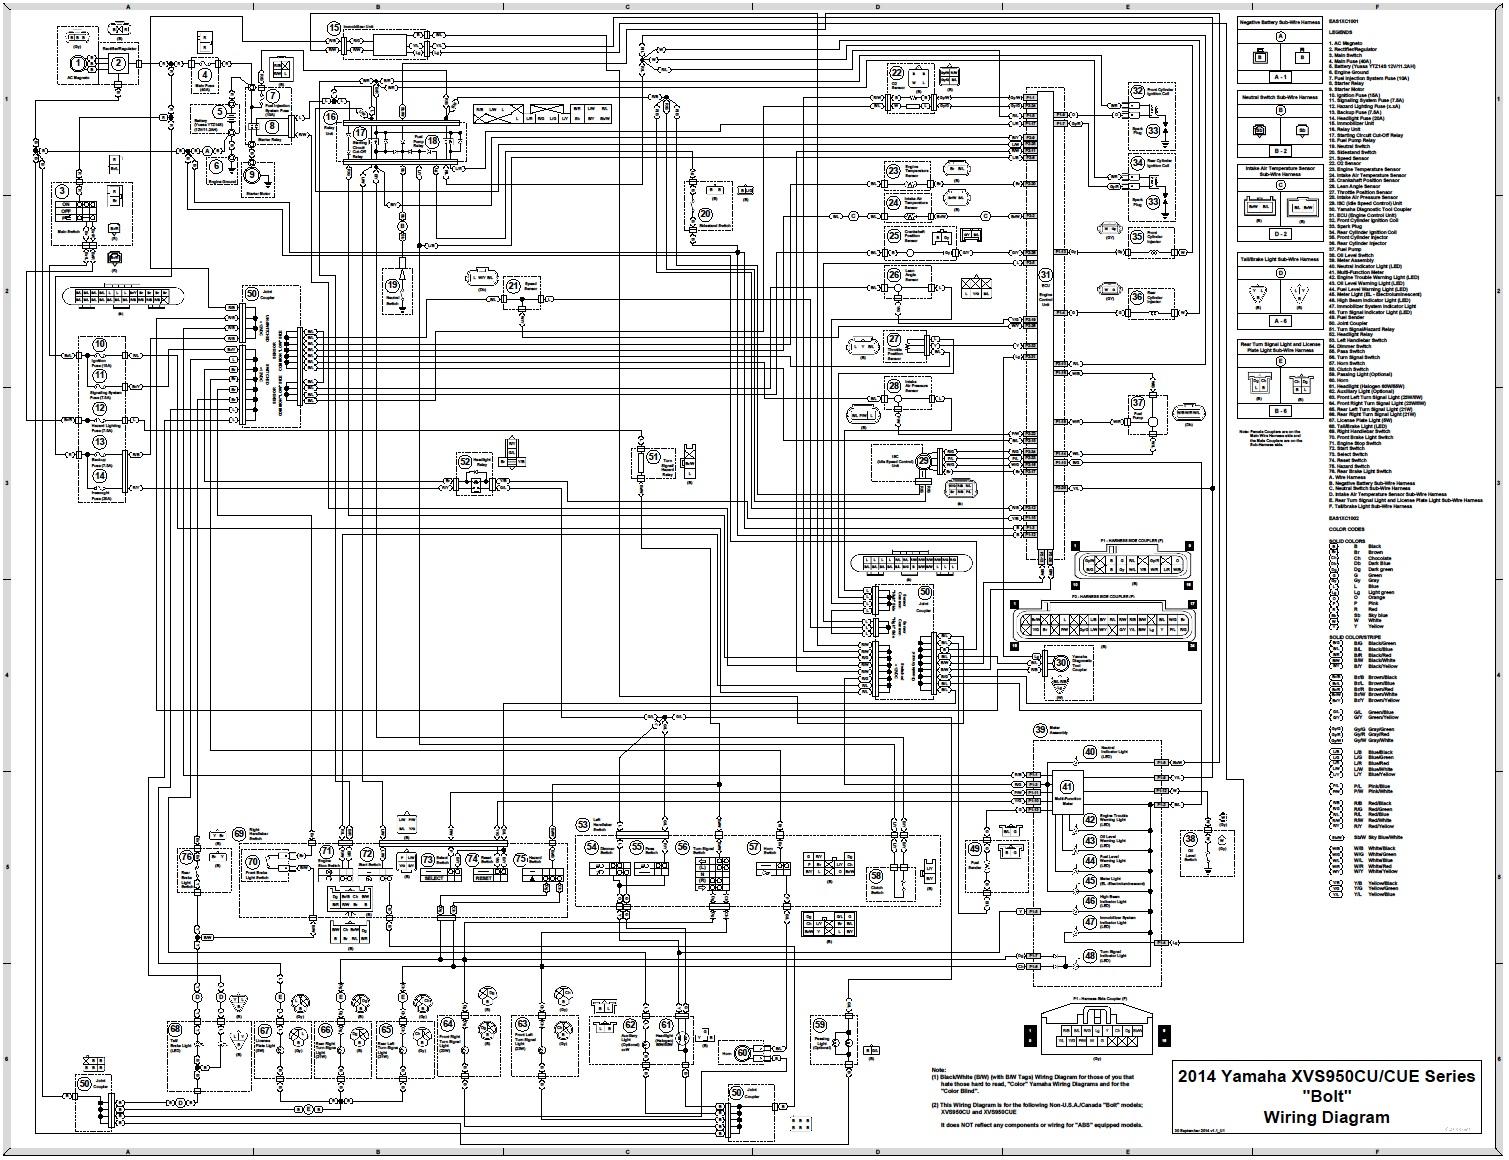 vibe subwoofer wiring diagram